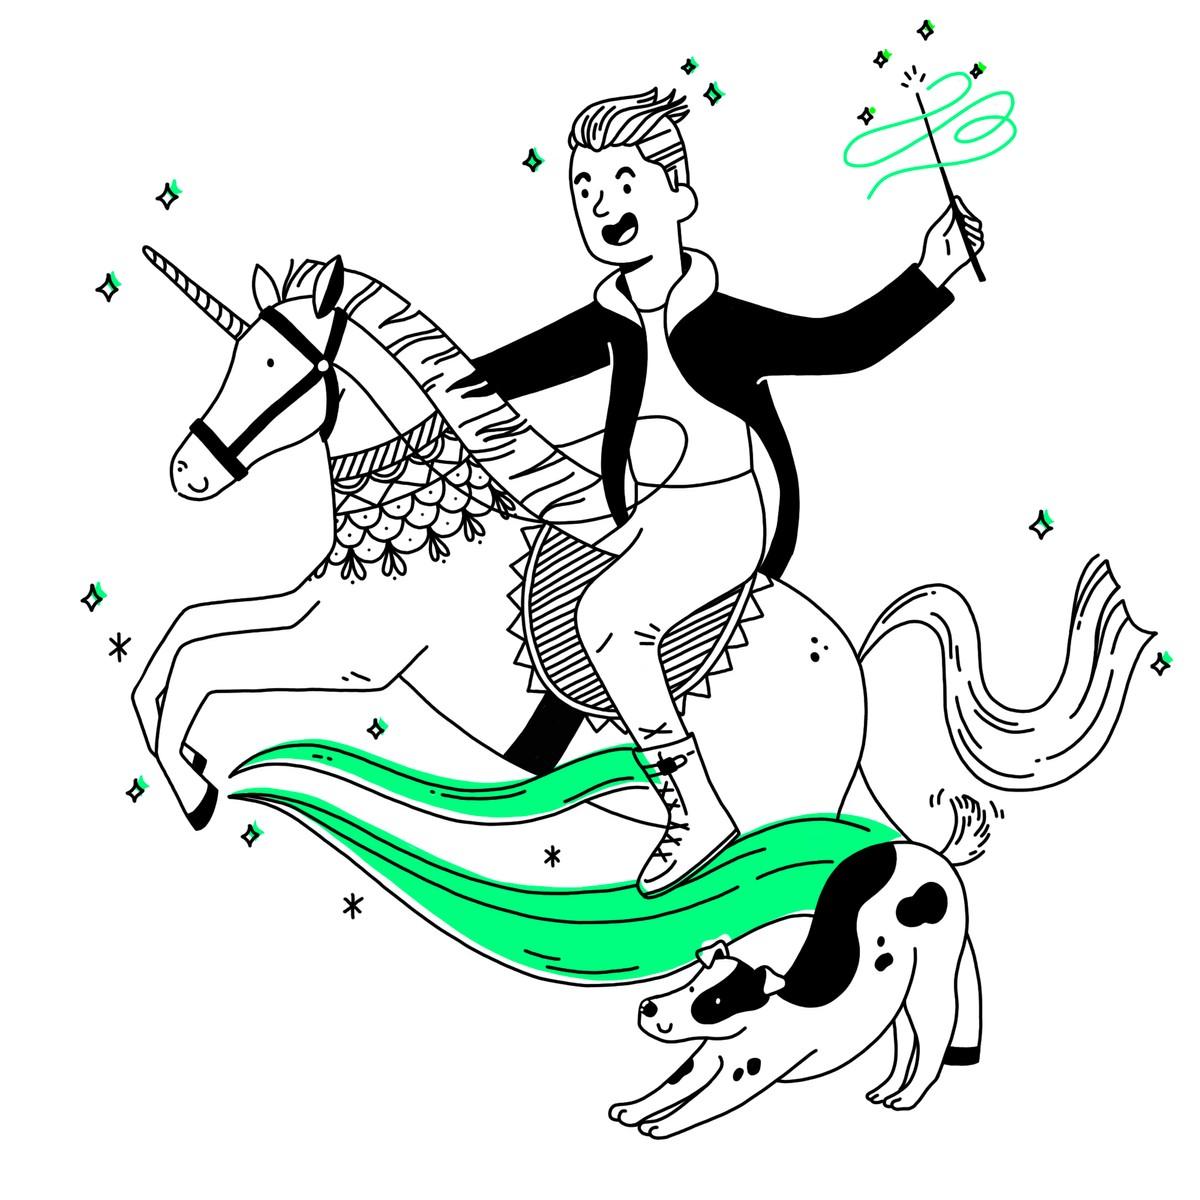 Man riding a unicorn